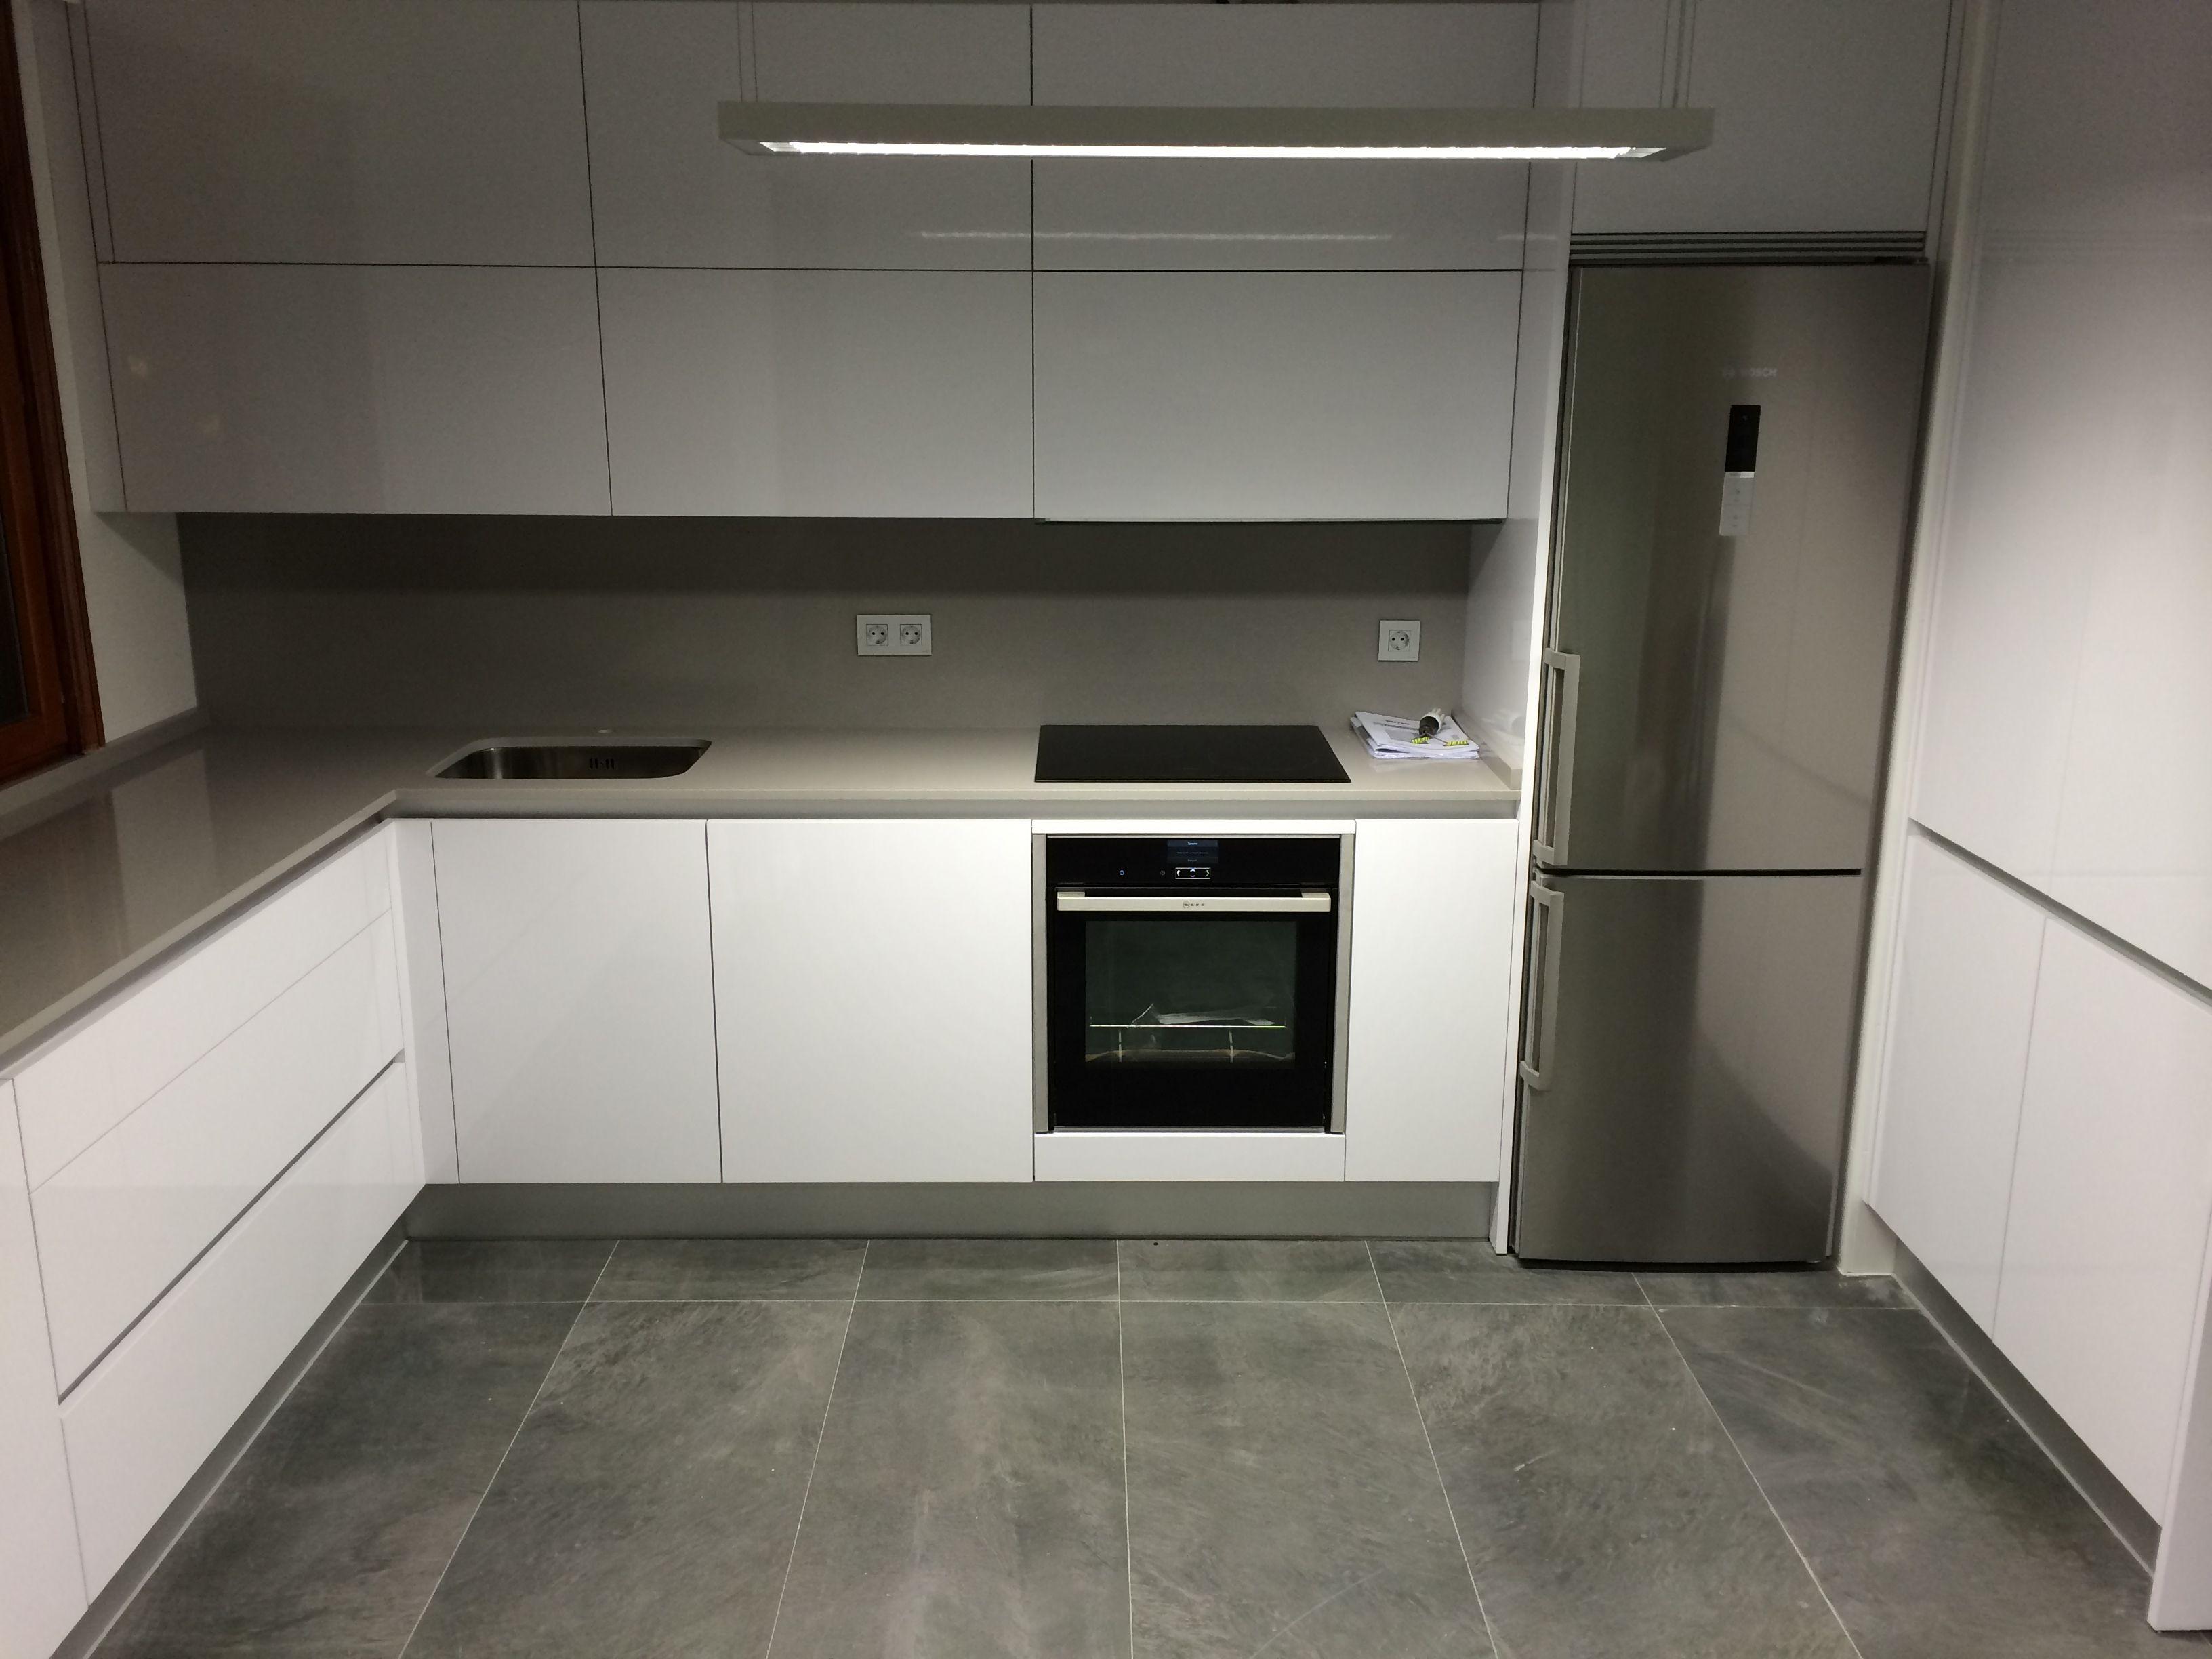 Cocina moderna blanca y solo gris oscuro. | Cocinas pequeñas ...